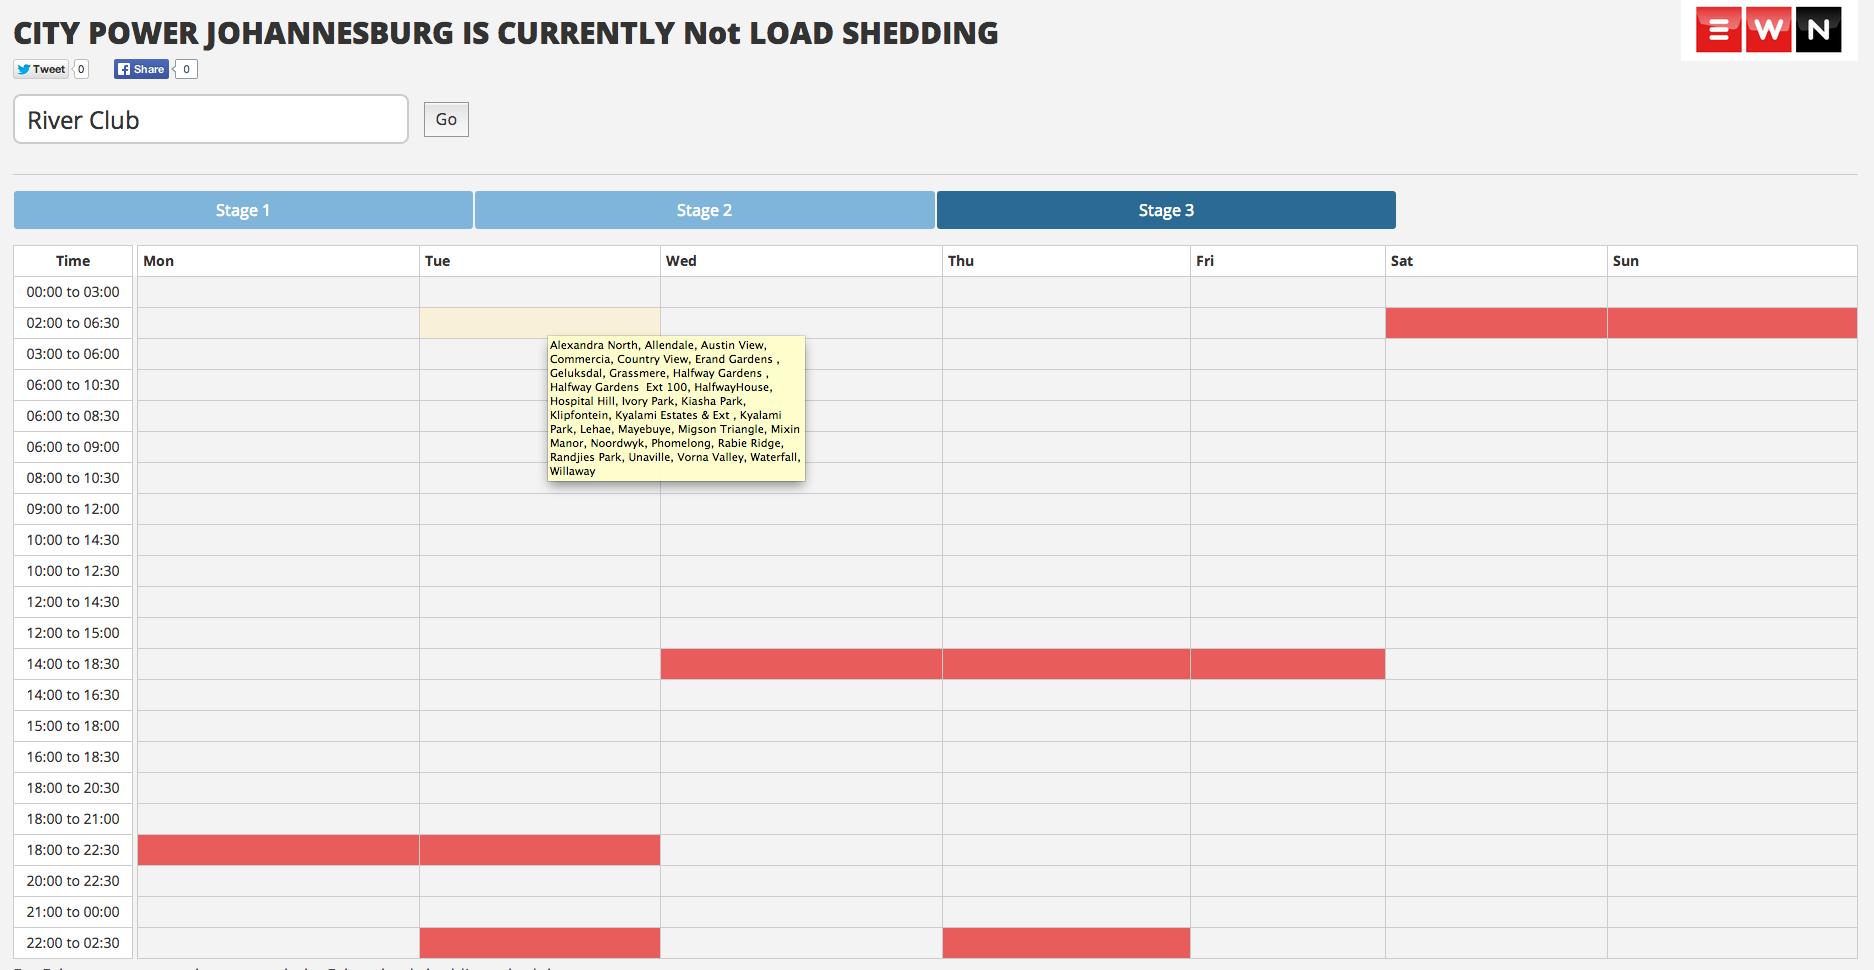 Load Shedding Johannesburg: Load-shedding Data Tool Gauteng